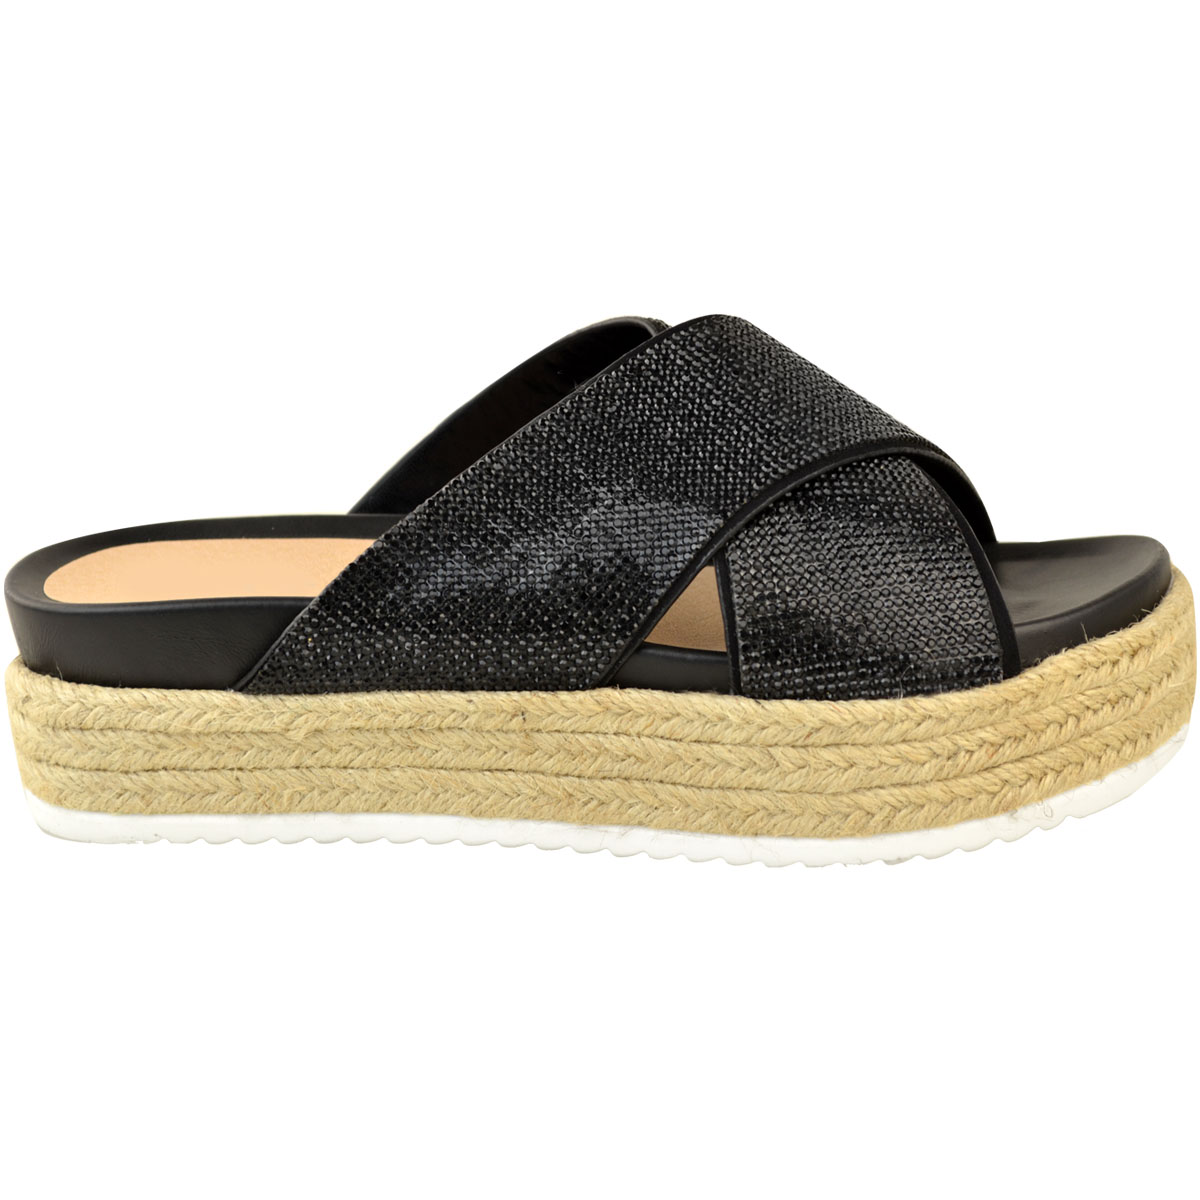 Womens-Ladies-Diamante-Slip-On-Sandals-Flatforms-Sparkly-Platform-Summer-Size-UK thumbnail 4